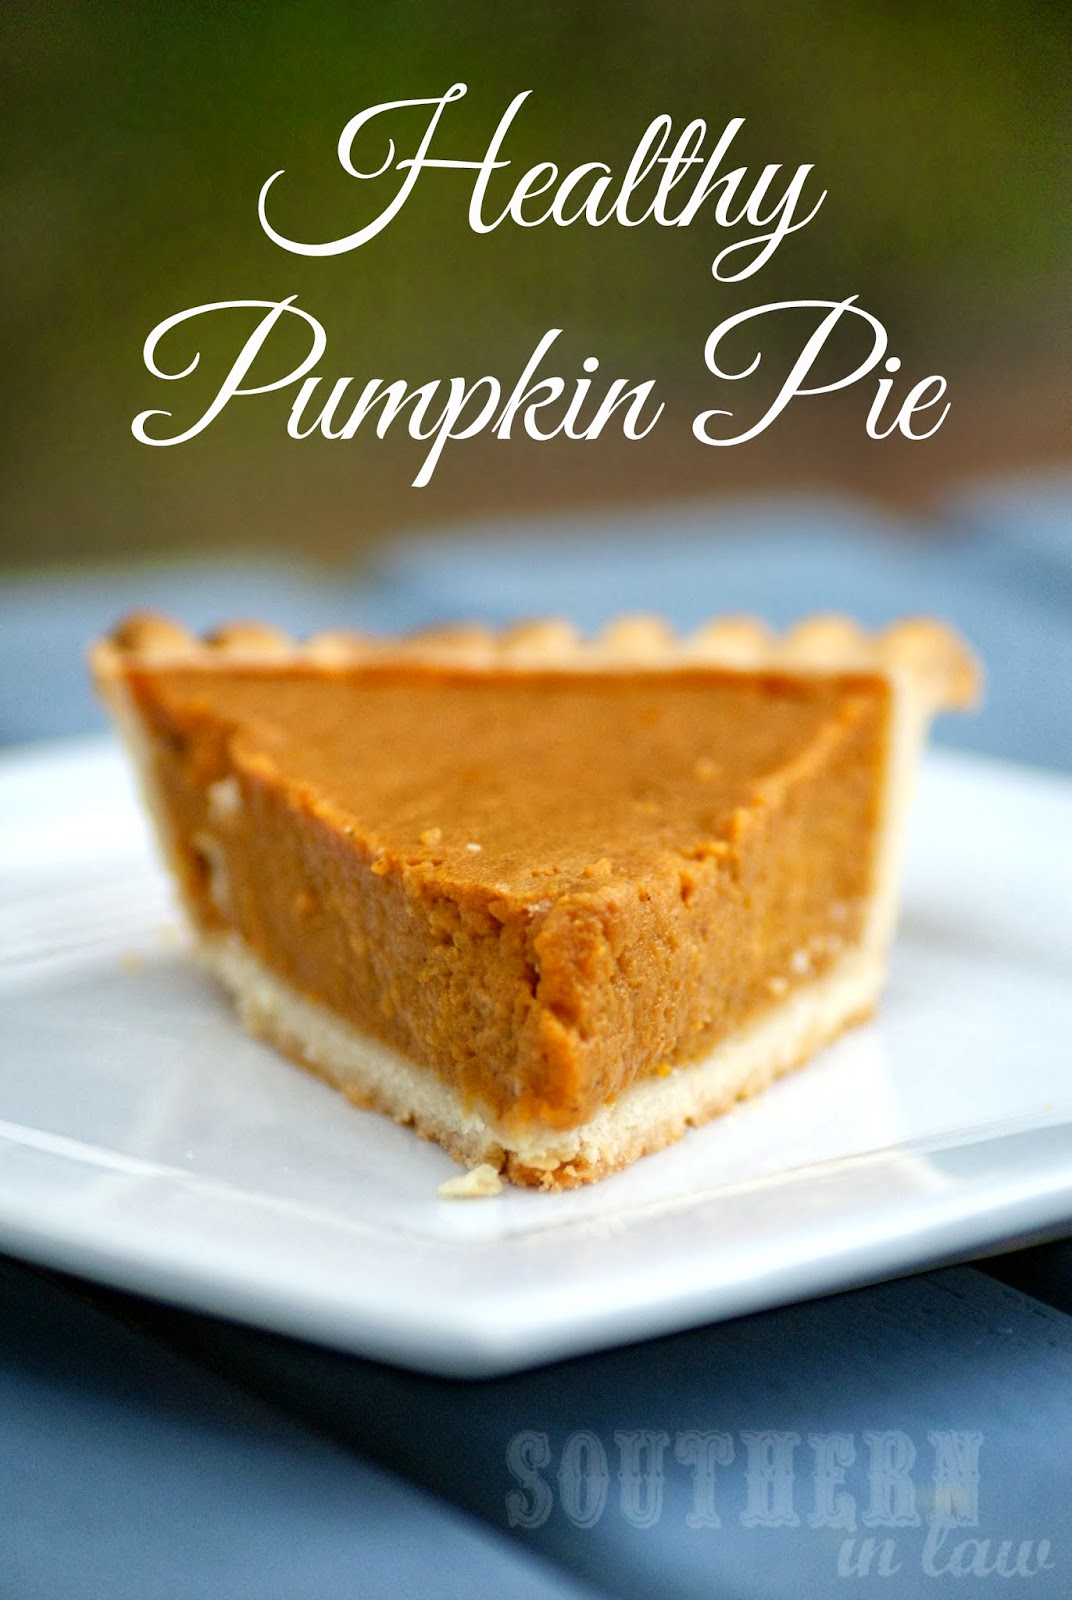 ... Healthy Living and Gluten Free Lifestyle Blog: Healthy Pumpkin Pie